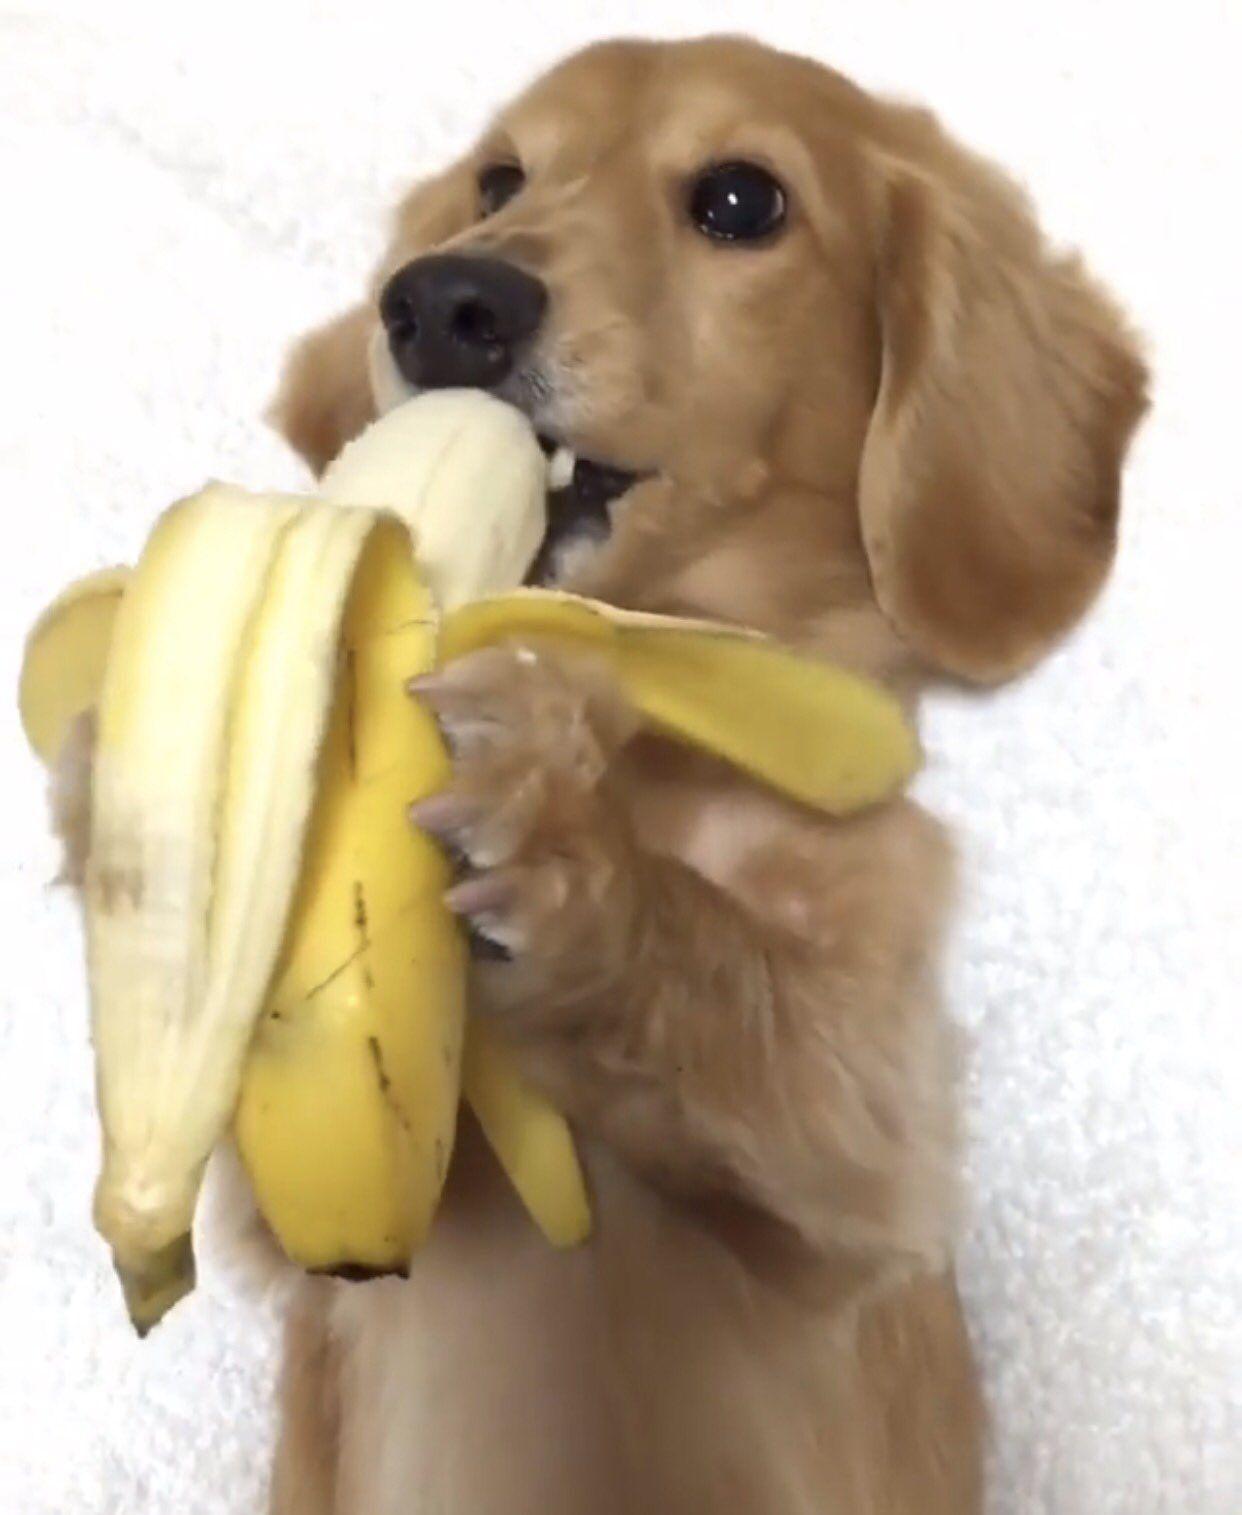 Gayweho Dogs 4 U On Dachshund Puppy Eating Bananas Super